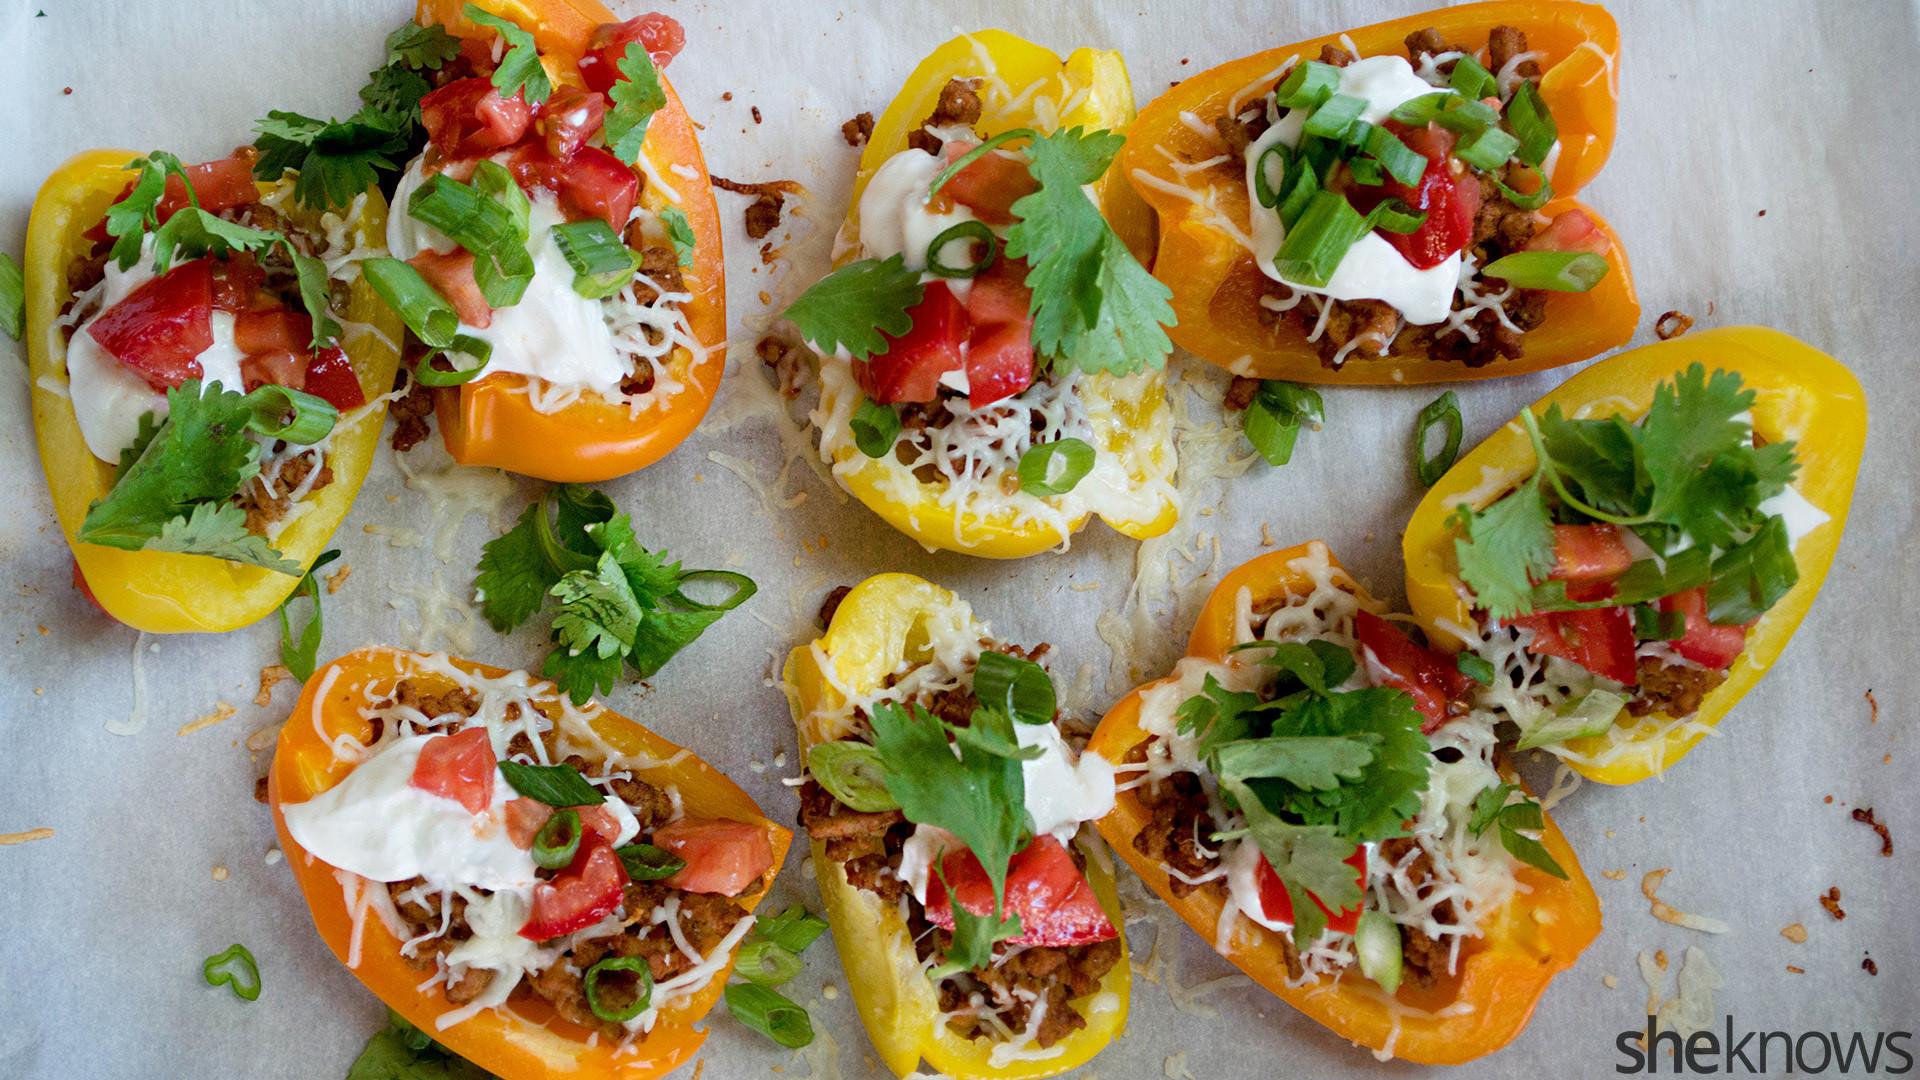 Healthy Nachos Recipe  3 Ways to make nachos healthier without sacrificing flavor